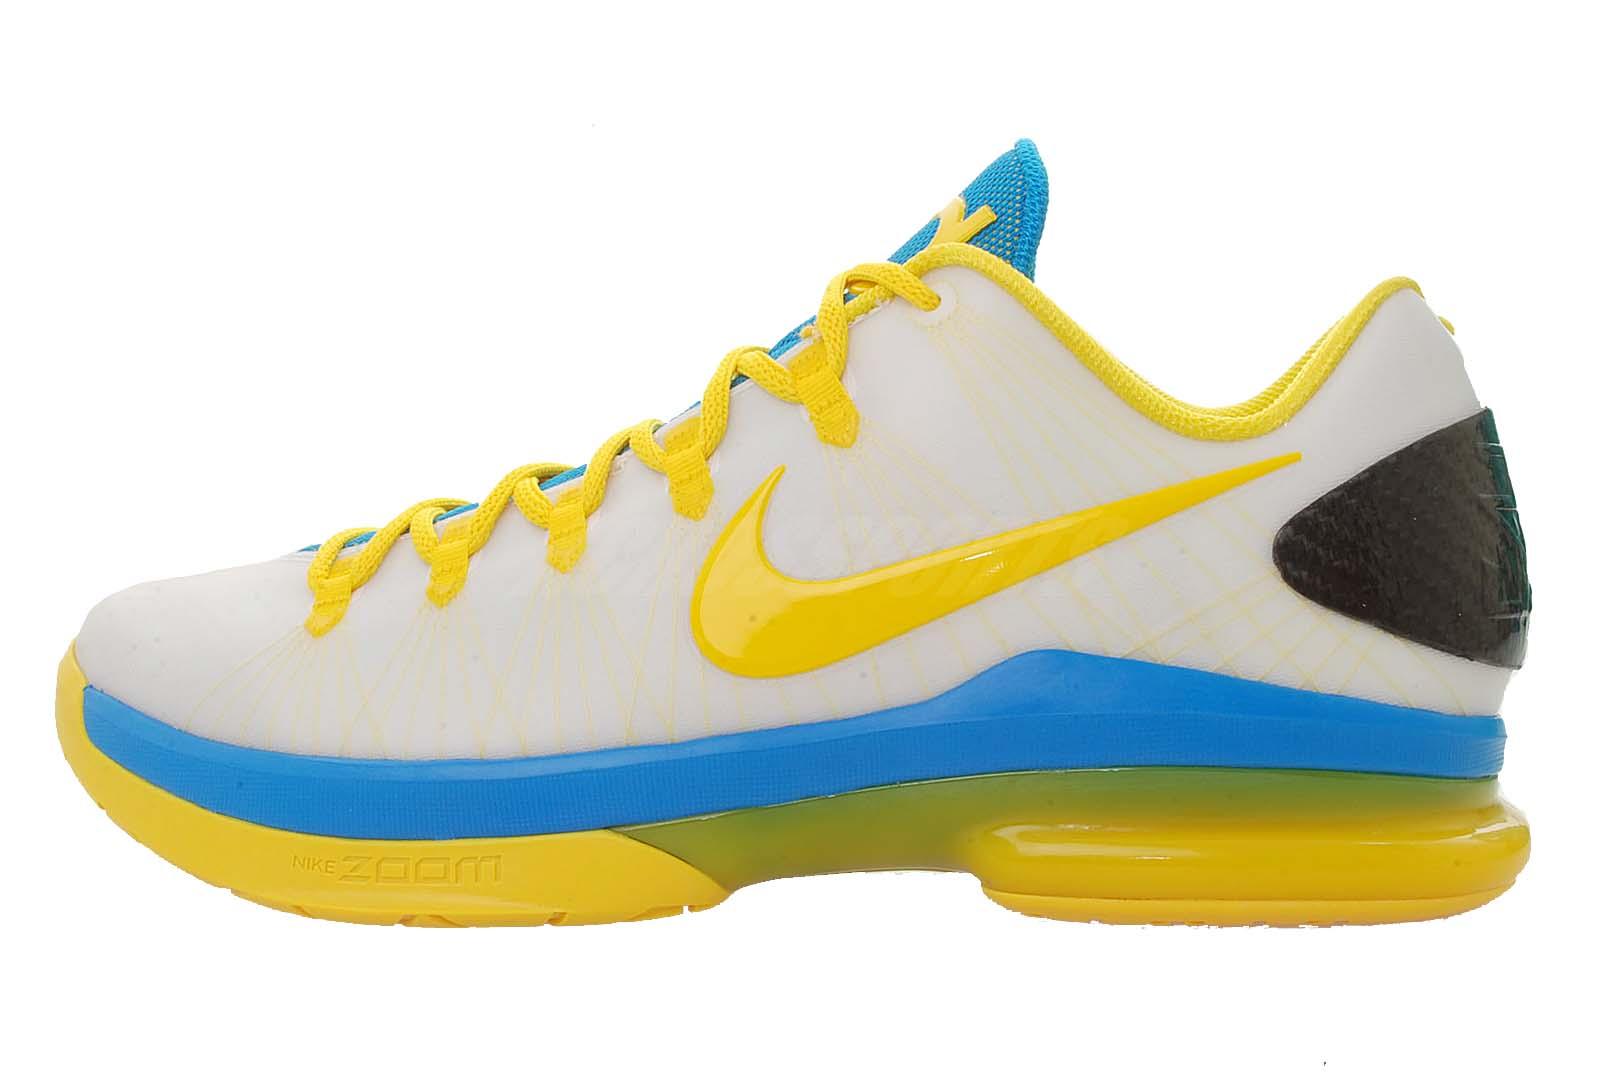 reputable site e3e5b 021e2 Nike KD V Elite 5 Playoffs Superhero Kevin Durant OKC White Blue Orange  Pick 1   Clothing, Shoes   Accessories, Men s Shoes, Athletic   eBay!